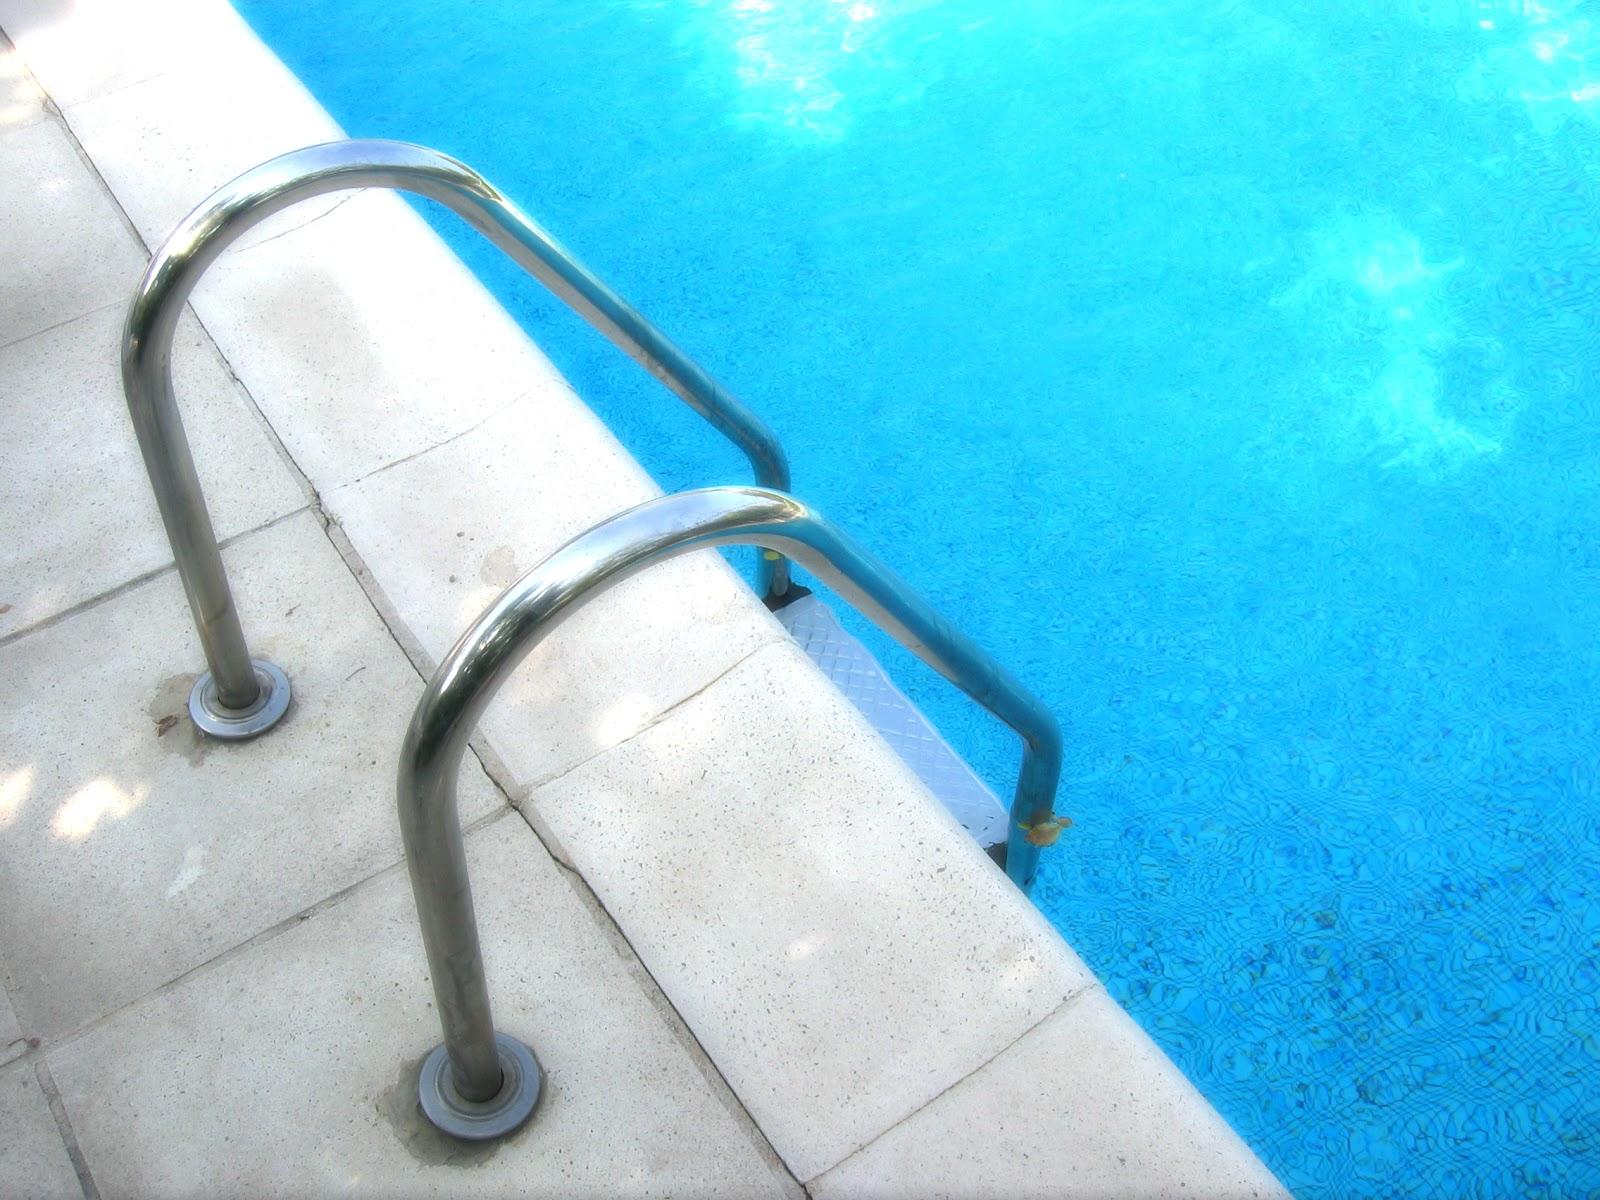 robot vortex 4 quand faut il vider l eau de sa piscine. Black Bedroom Furniture Sets. Home Design Ideas